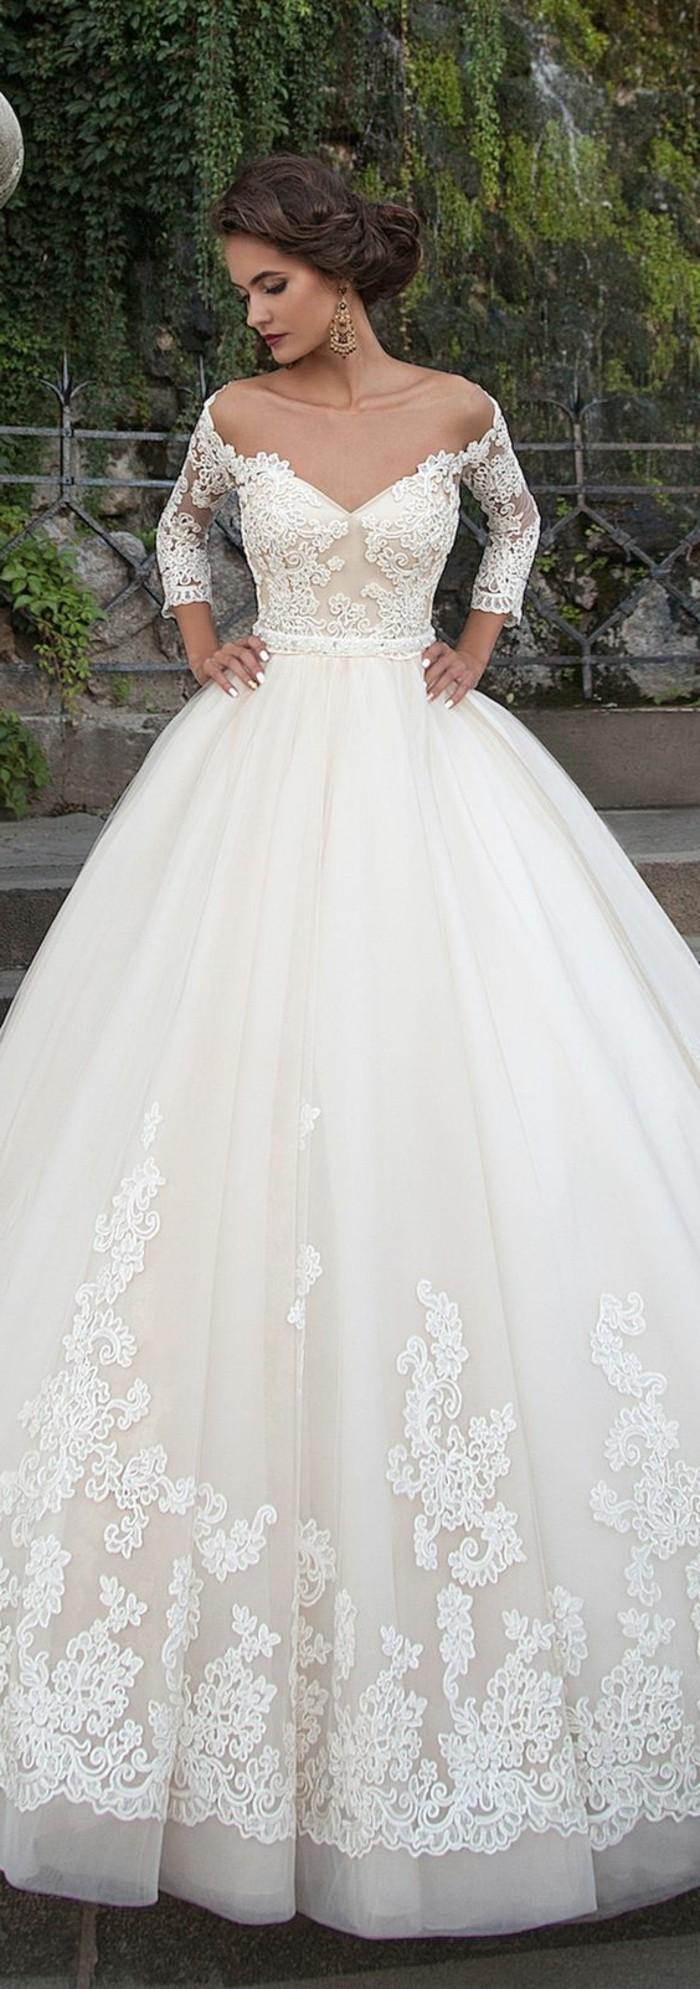 robe-mariee-dentelle-robe-du-mariage-noble-beaute-princesse-robe